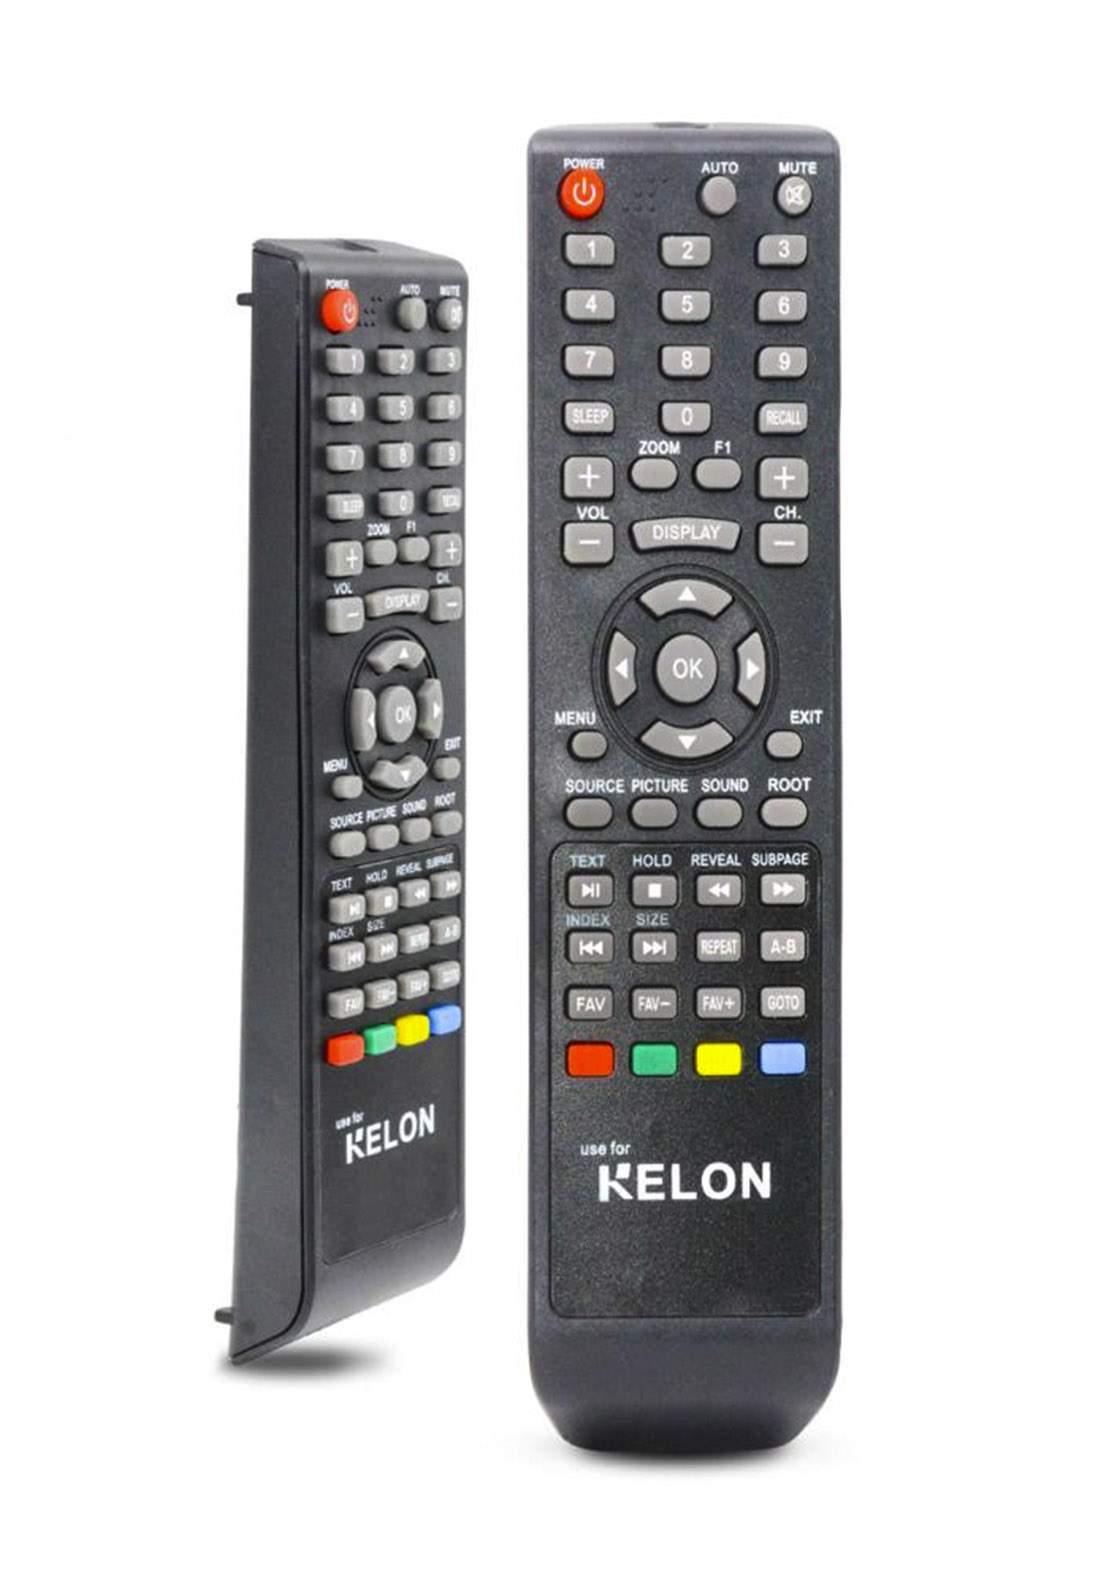 Remote Control For Kelon Plasma TV (A-293) جهاز تحكم عن بعد